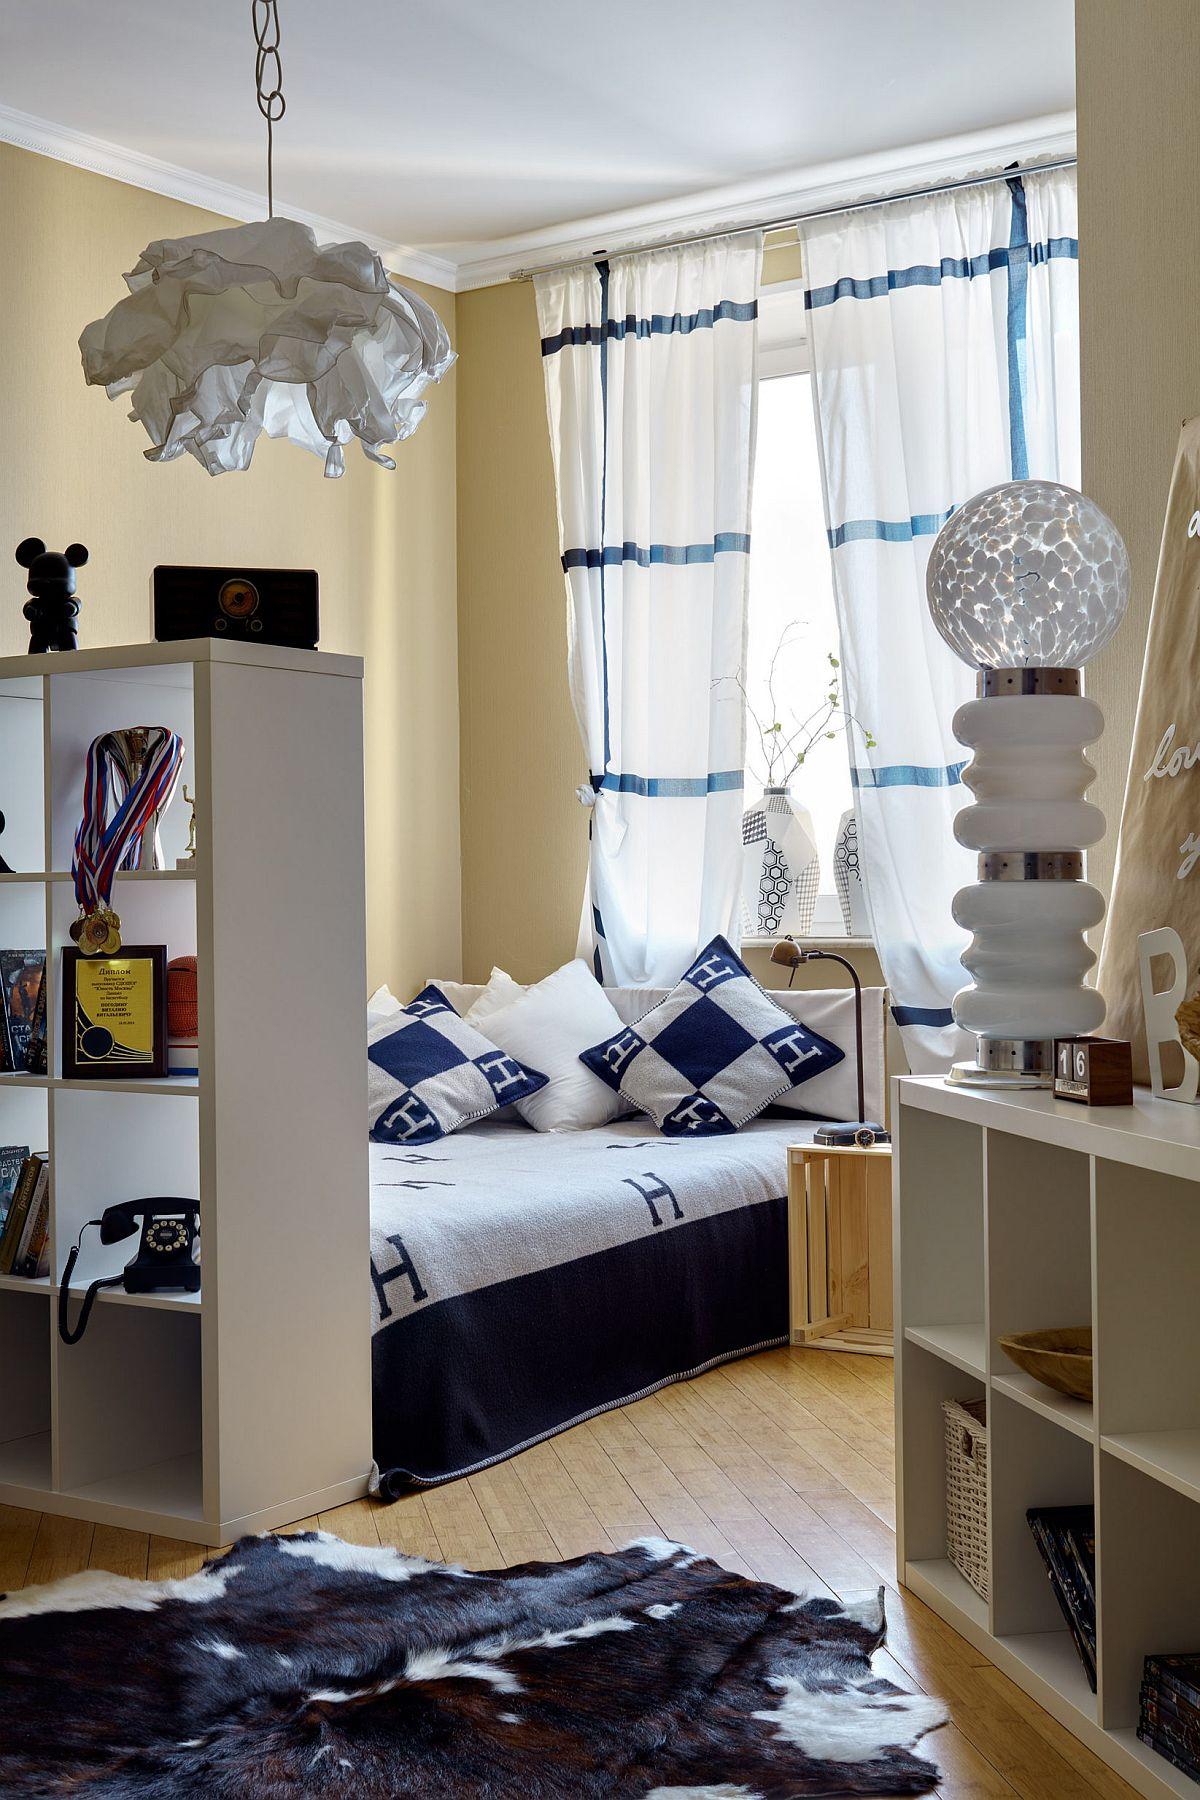 adelaparvu.com despre locuinta pentru student, designer Natalia Pogodina, Foto Sergey Ananiev (1)